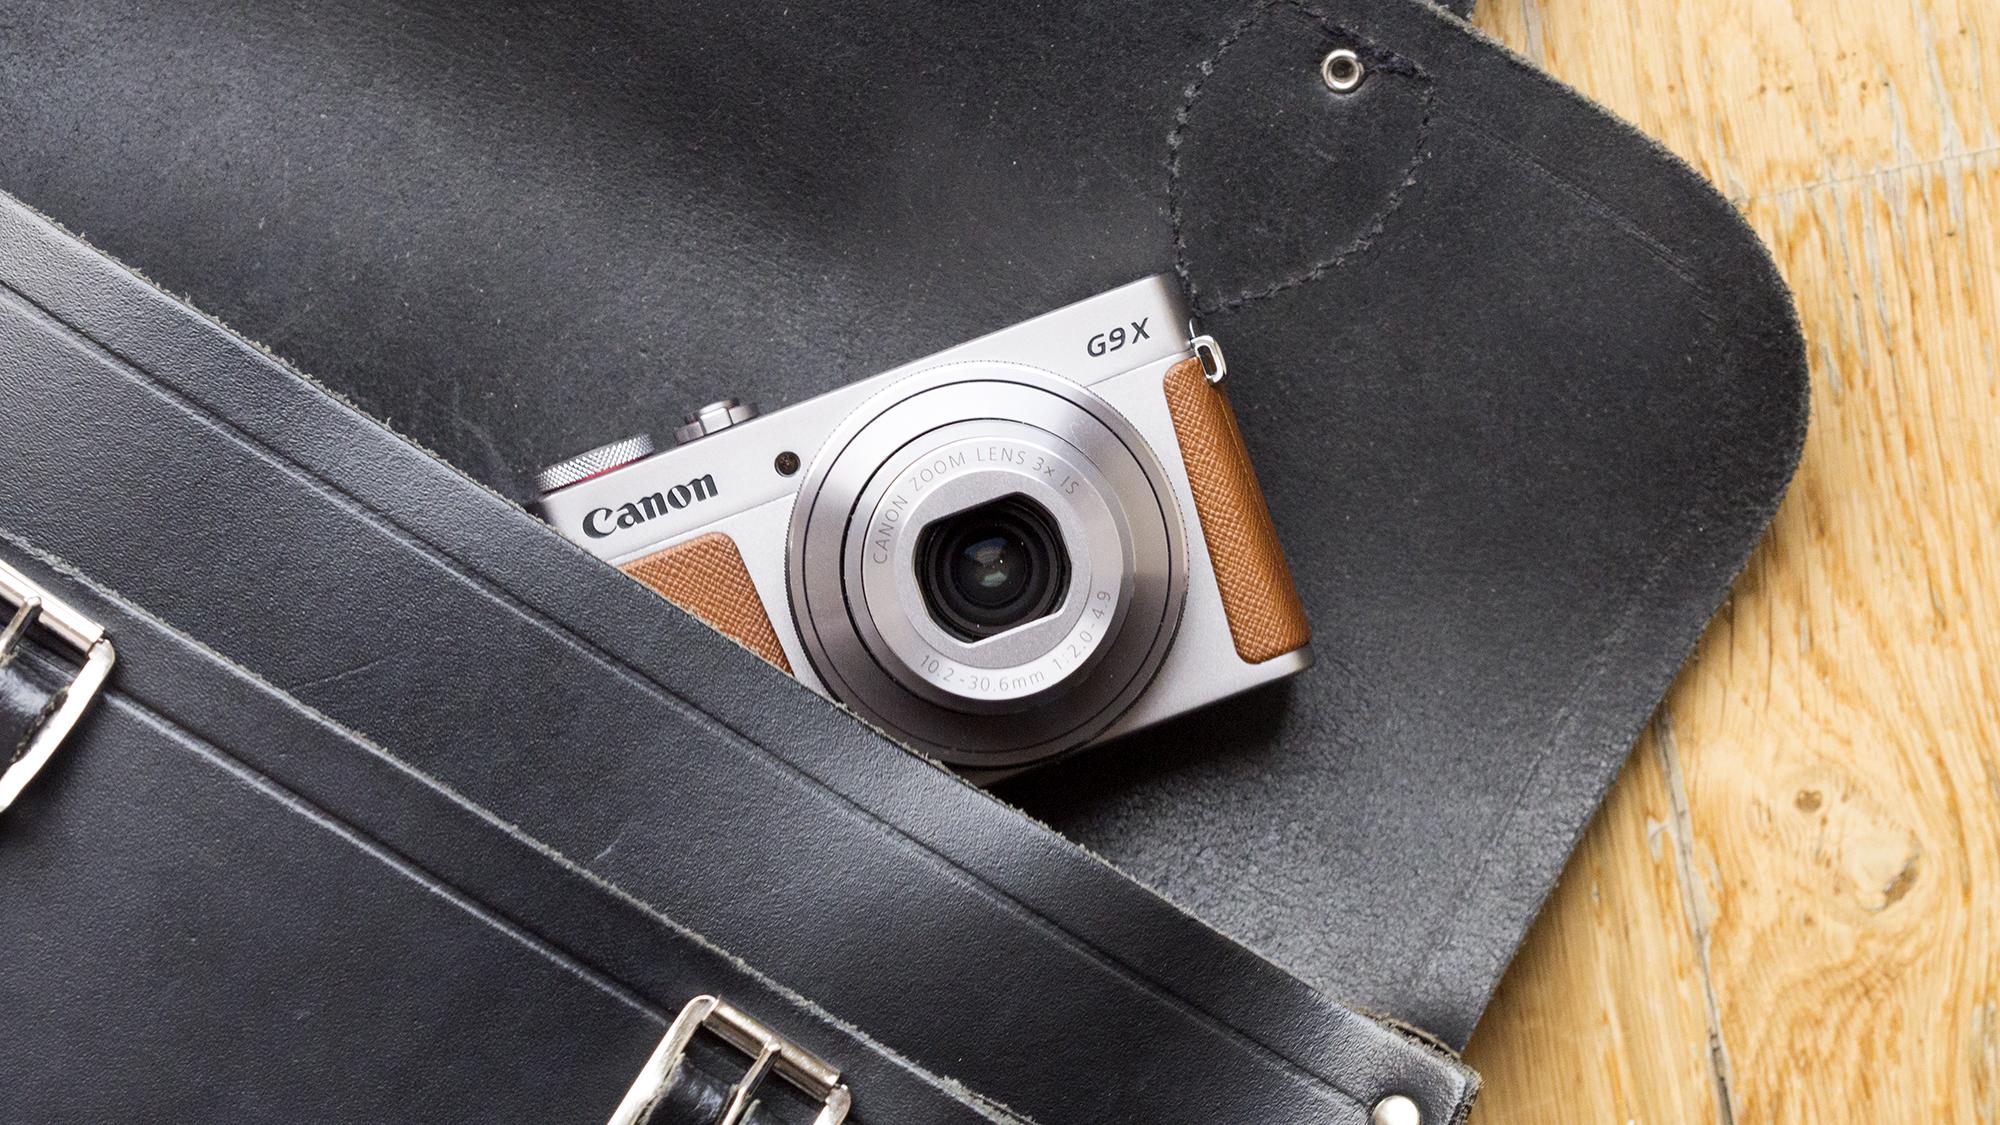 Canon Powershot G9 X Techradar G3 Wi Fi And Nfc